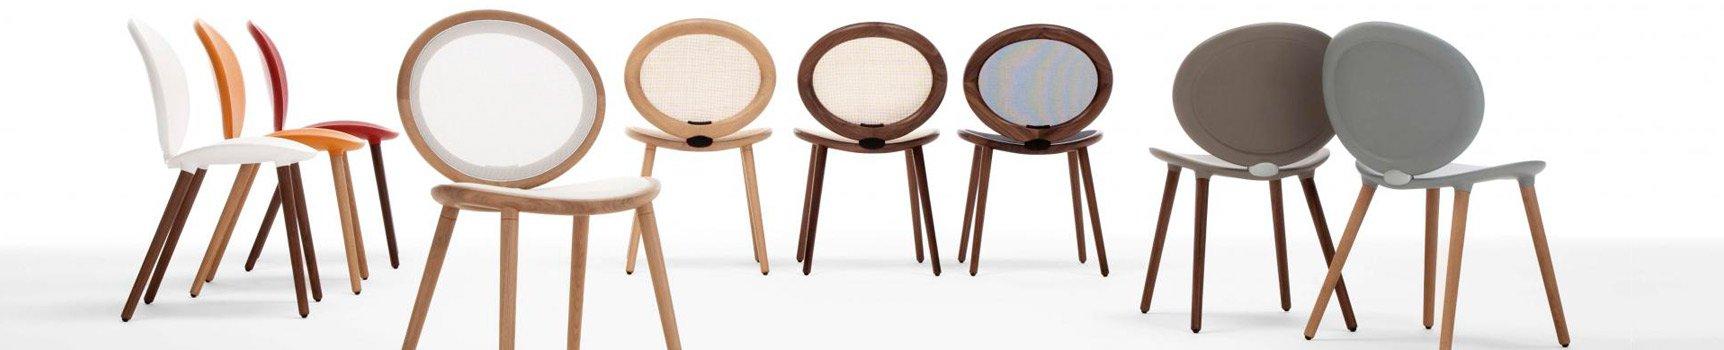 Stühle | Hocker | Bänke